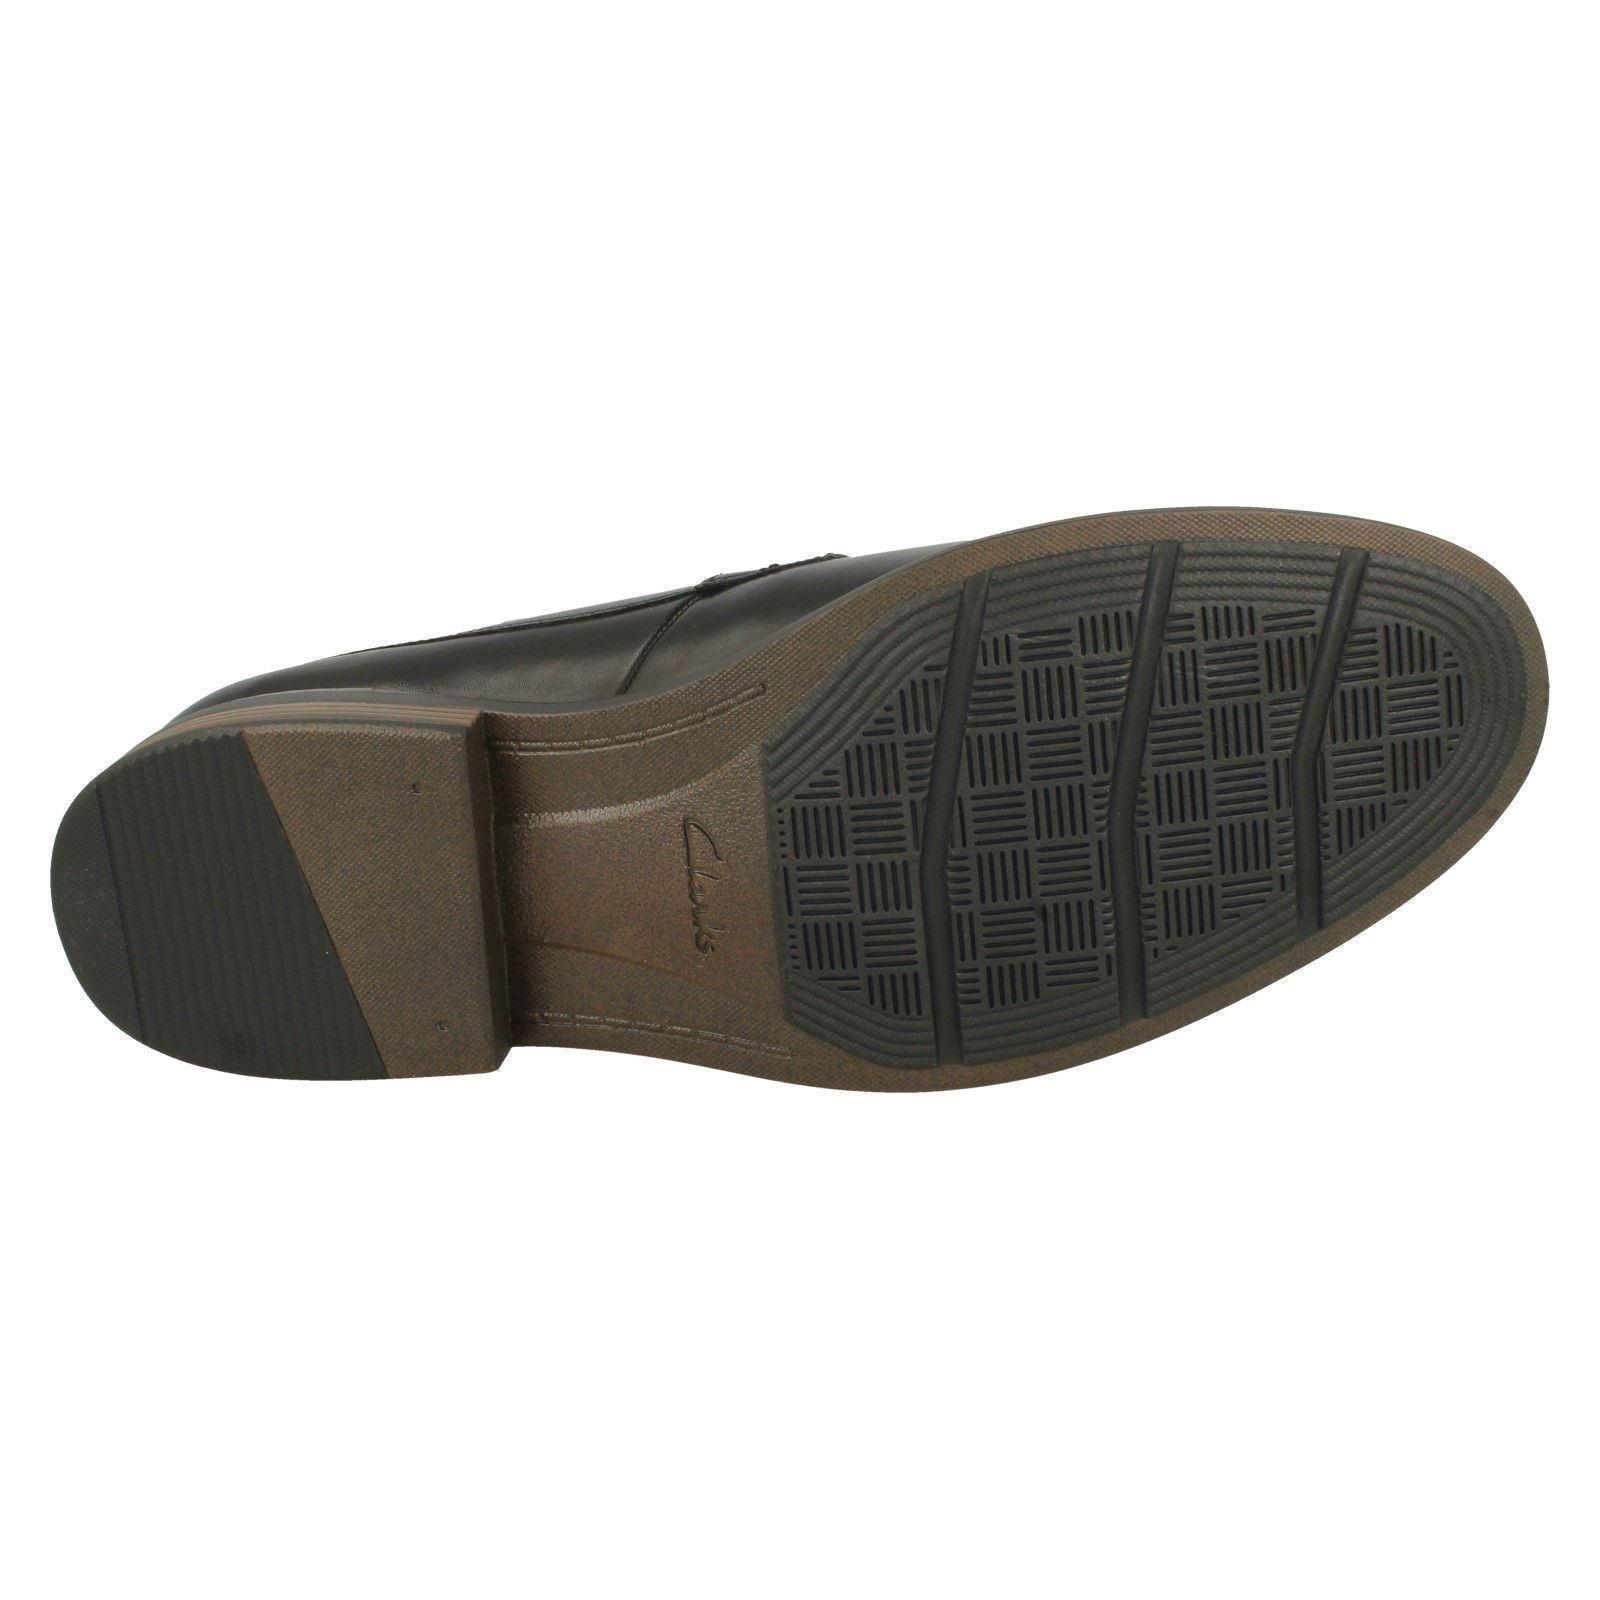 Uomo Smart Clarks Lace Up Leder Smart Uomo Toe Cap Schuhes The Style - Becken Cap d7f351